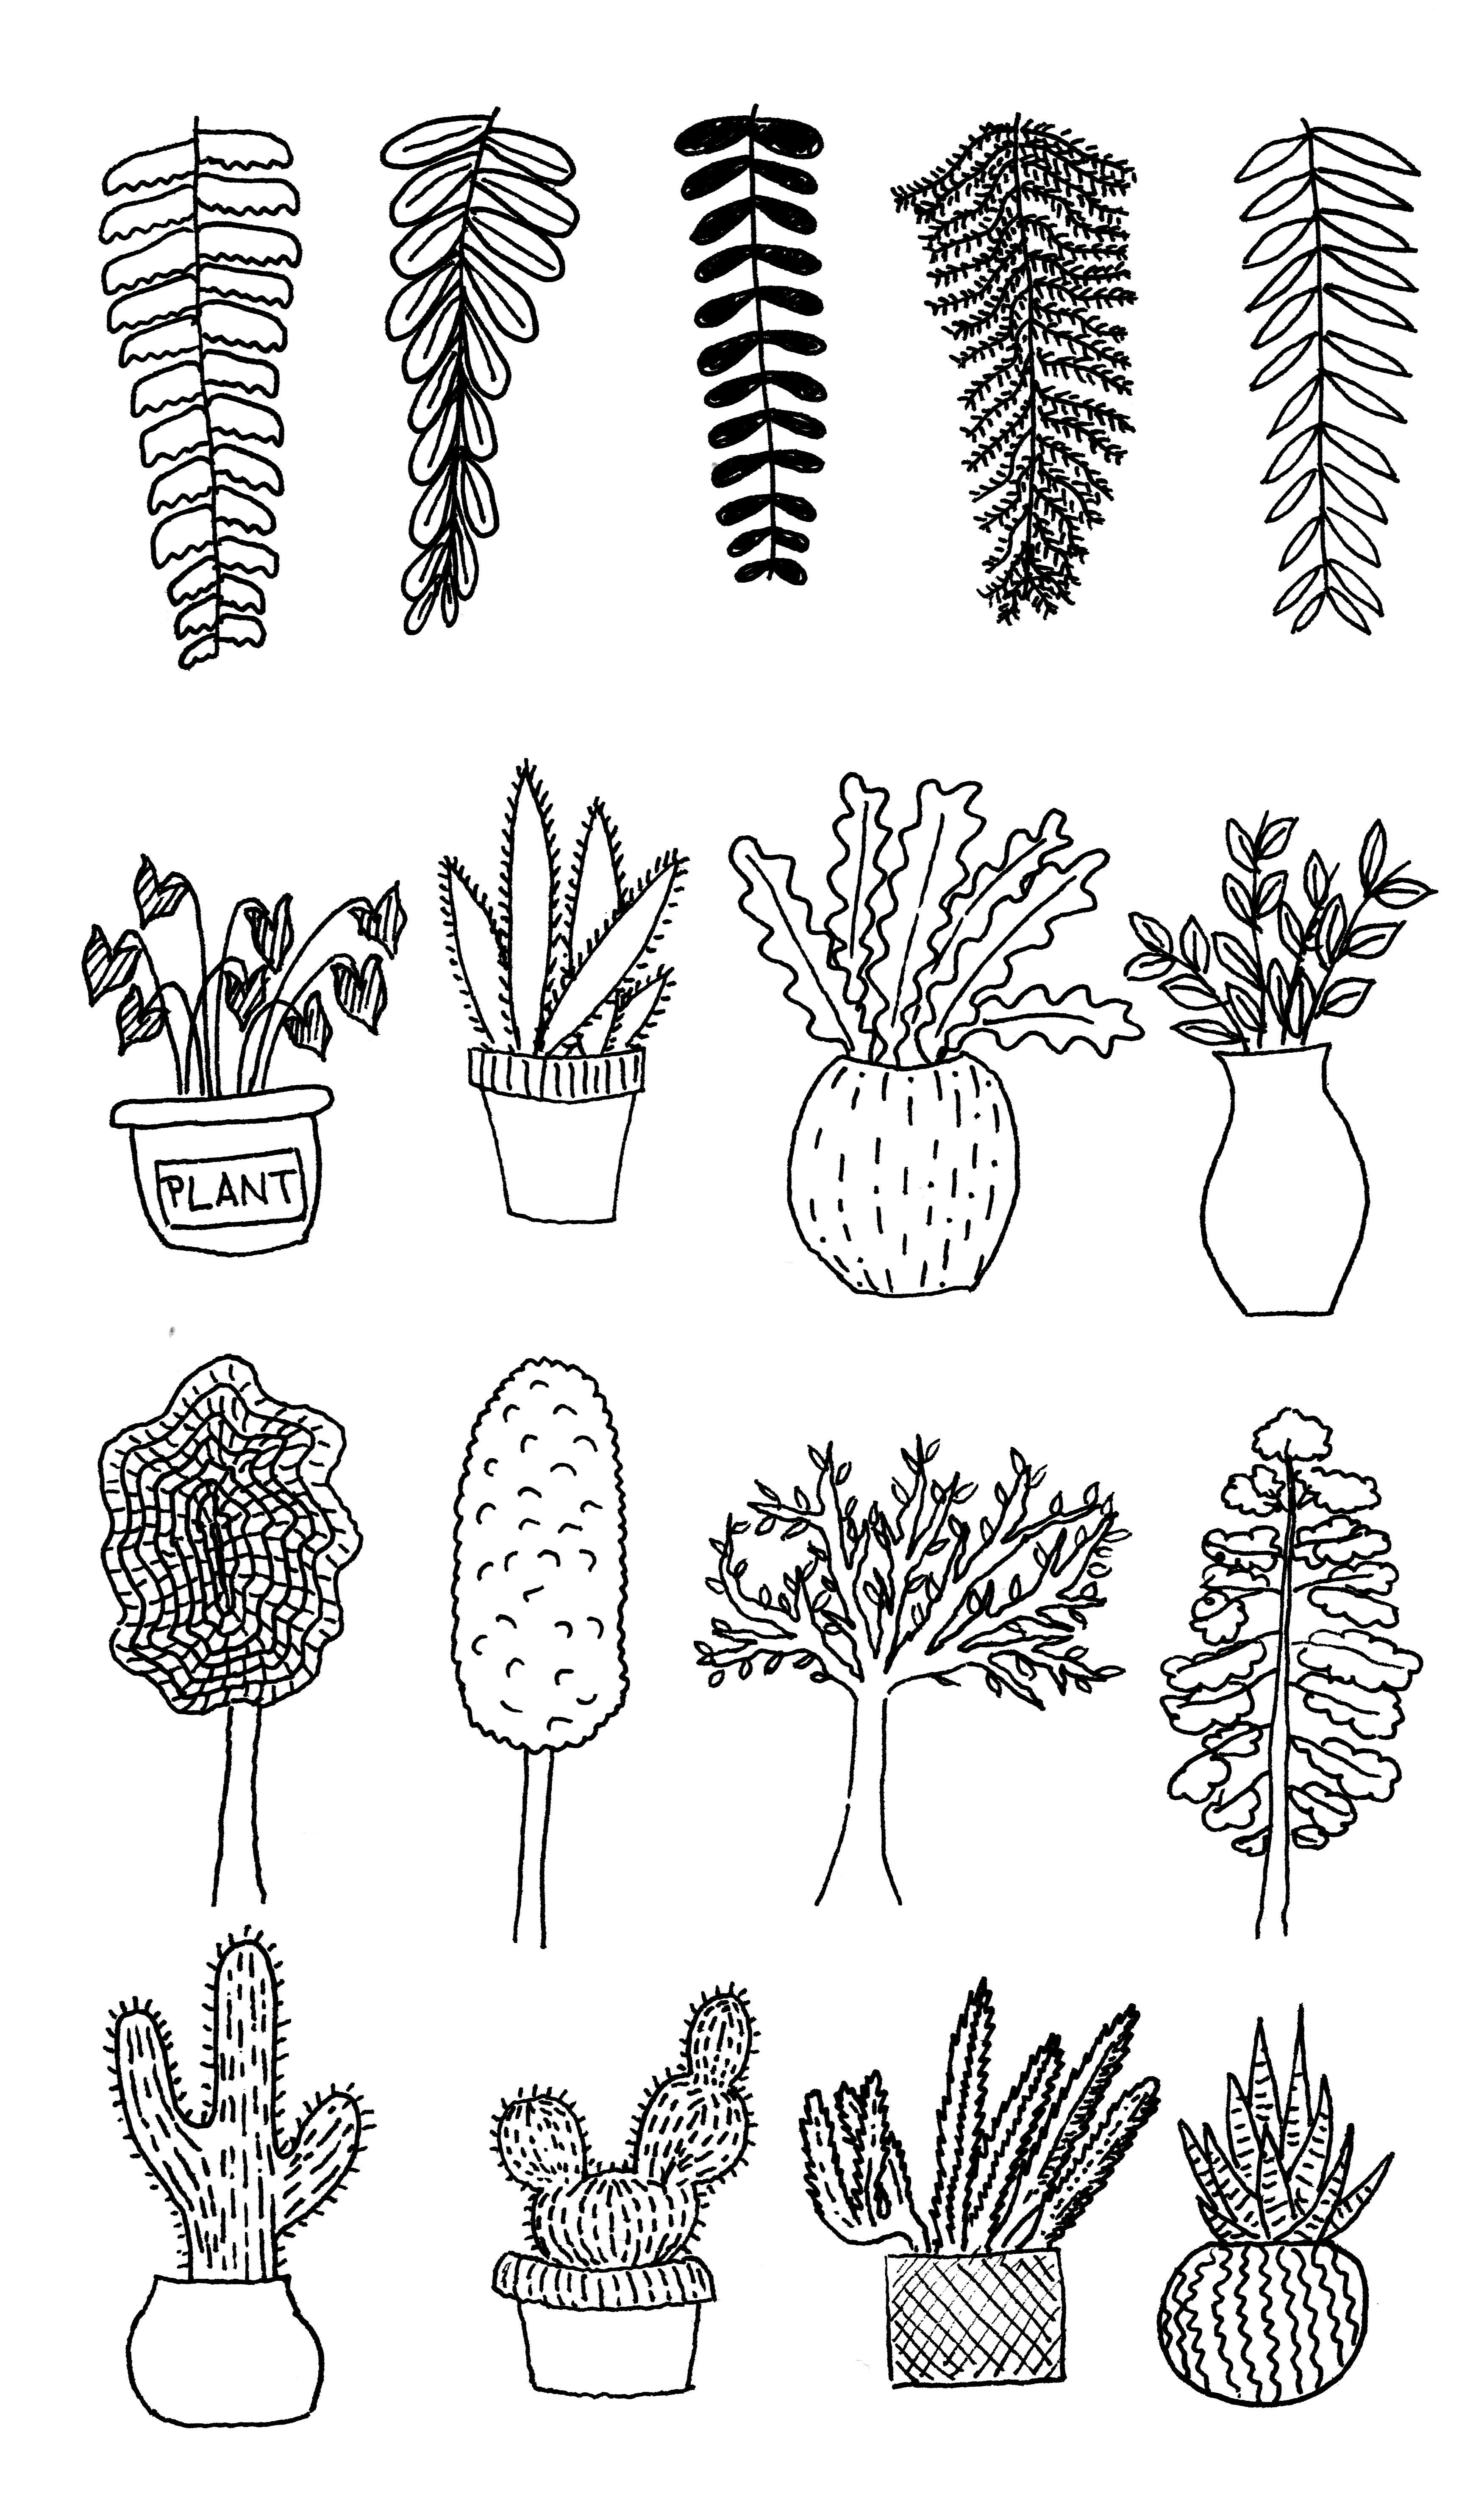 Plants and plants and plants and plants #coloring